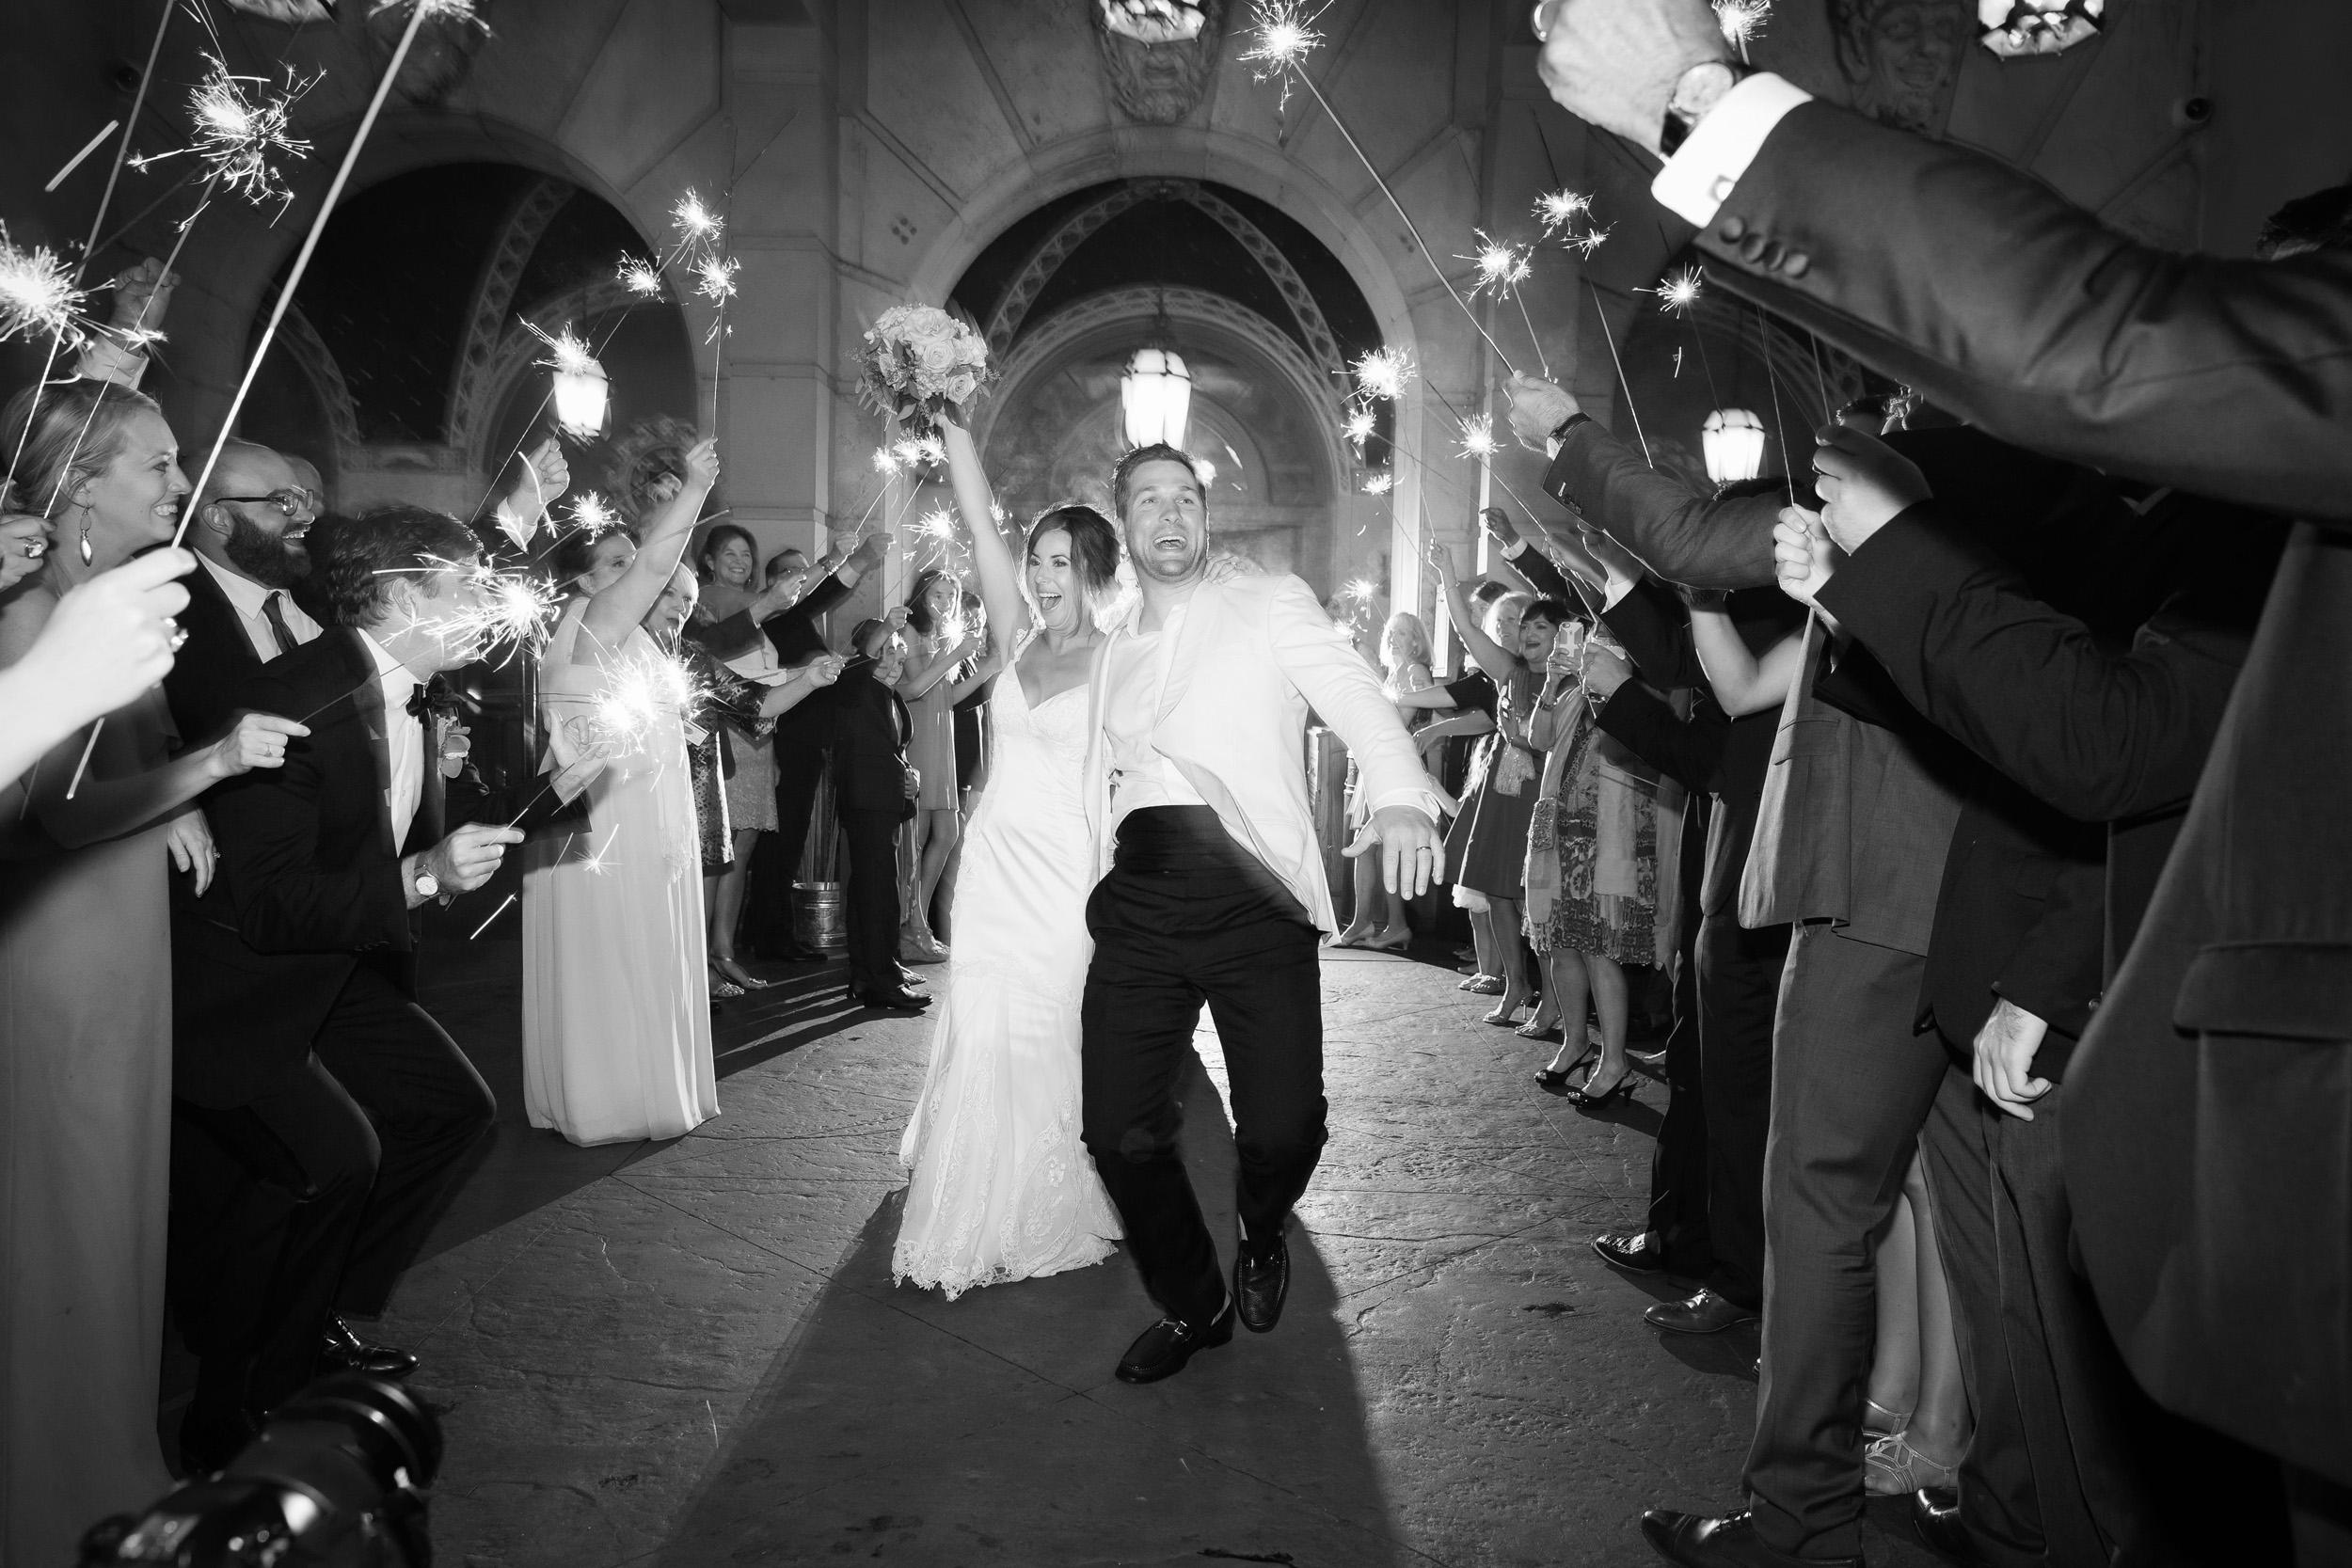 Colorado-Springs-Wedding-Photography-SS-012.jpg